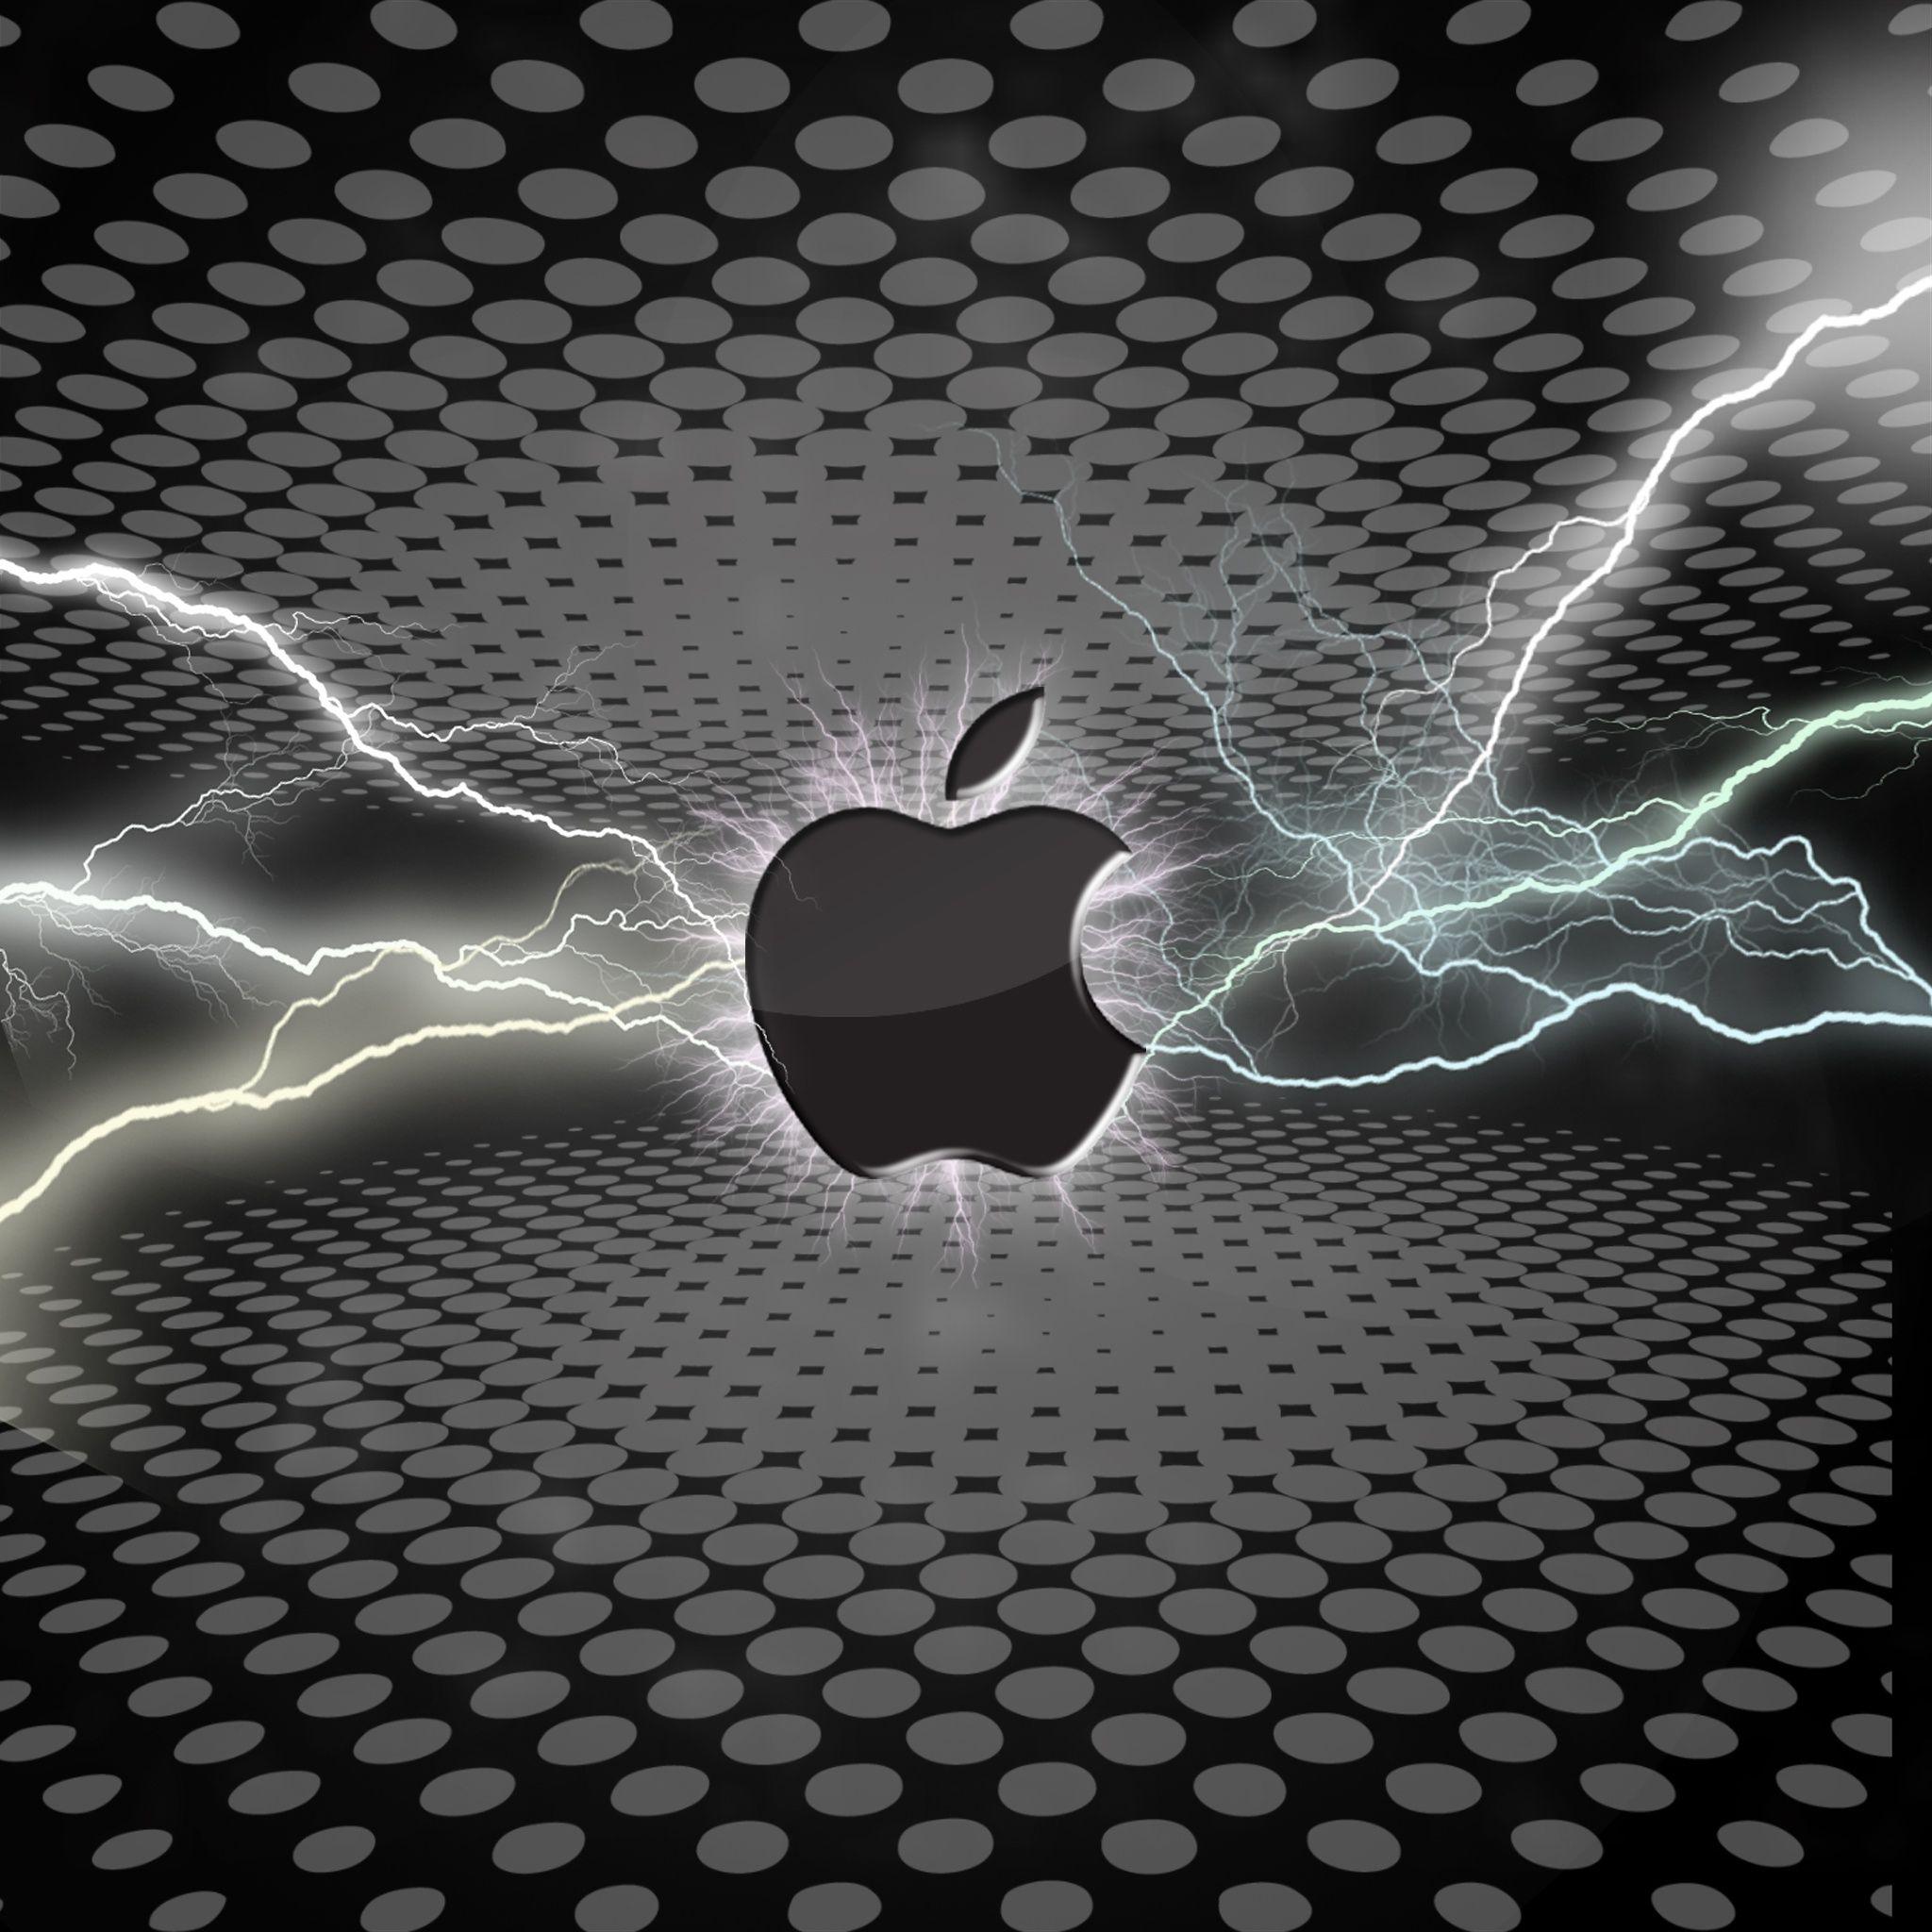 Pin by Retina Apple on iPad Retina Wallpaper Apple